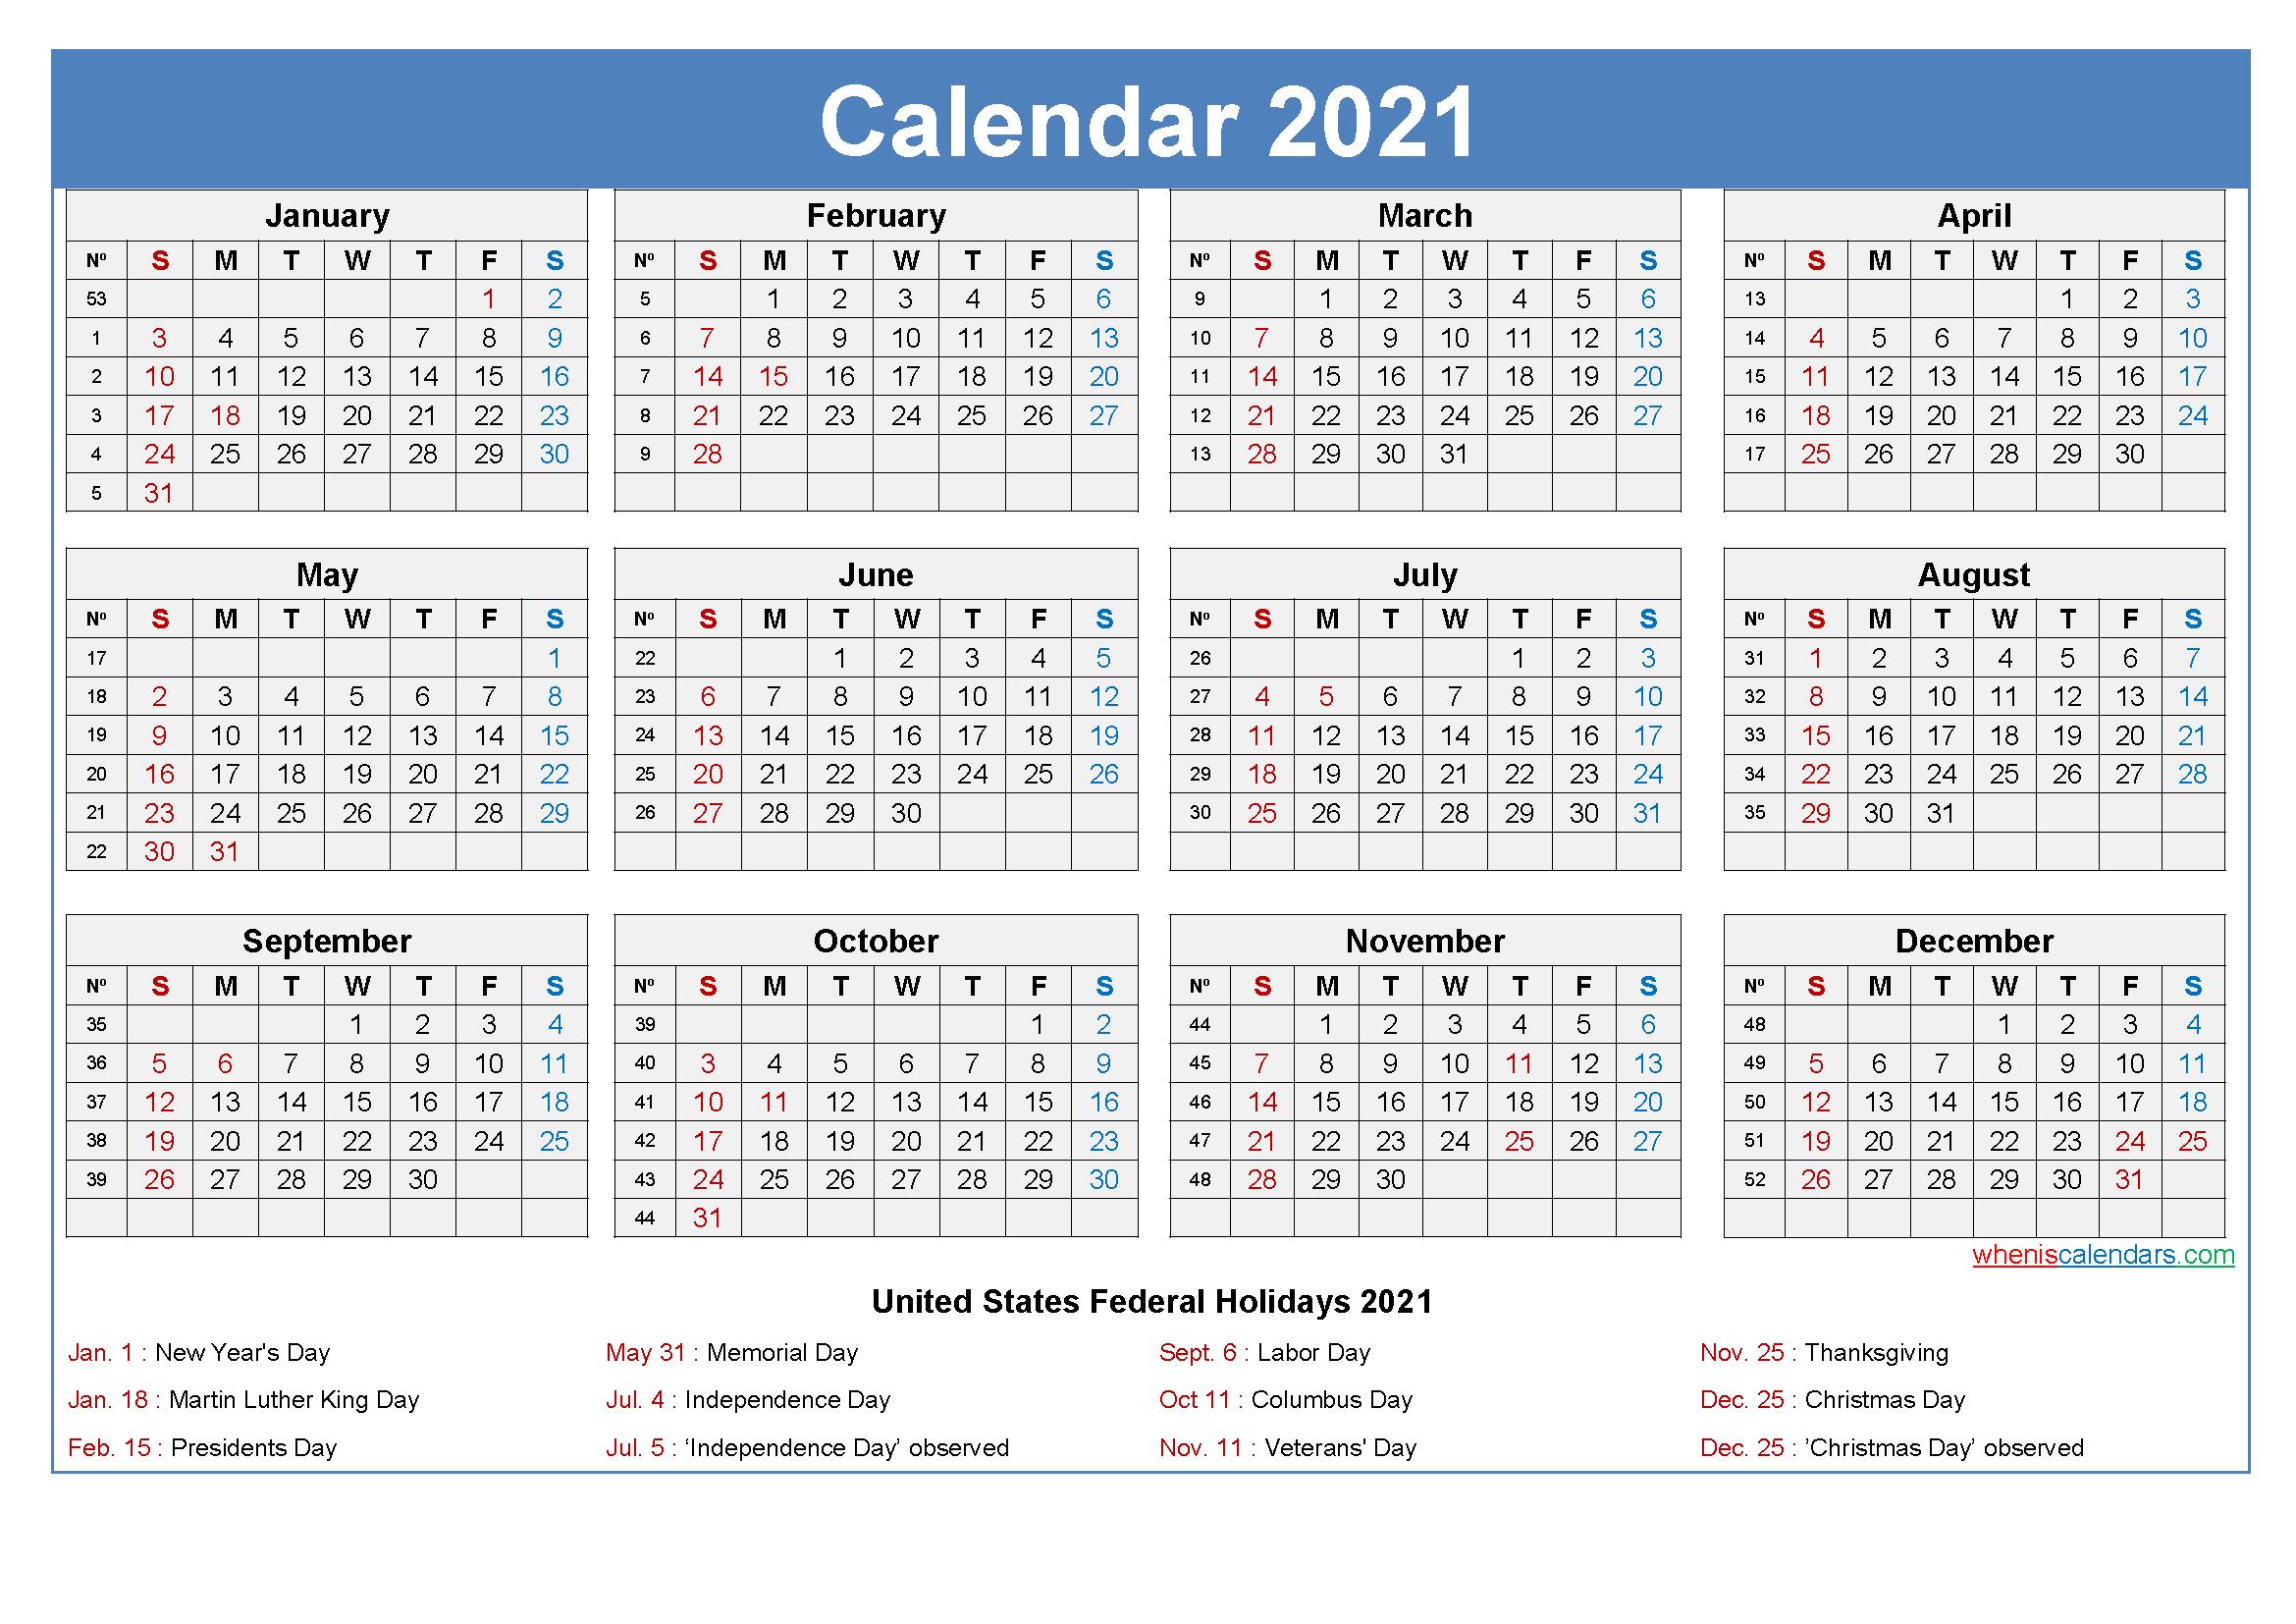 Large Desk Calendar 2021 With Holidays regarding 2021 Calendar Free Printable